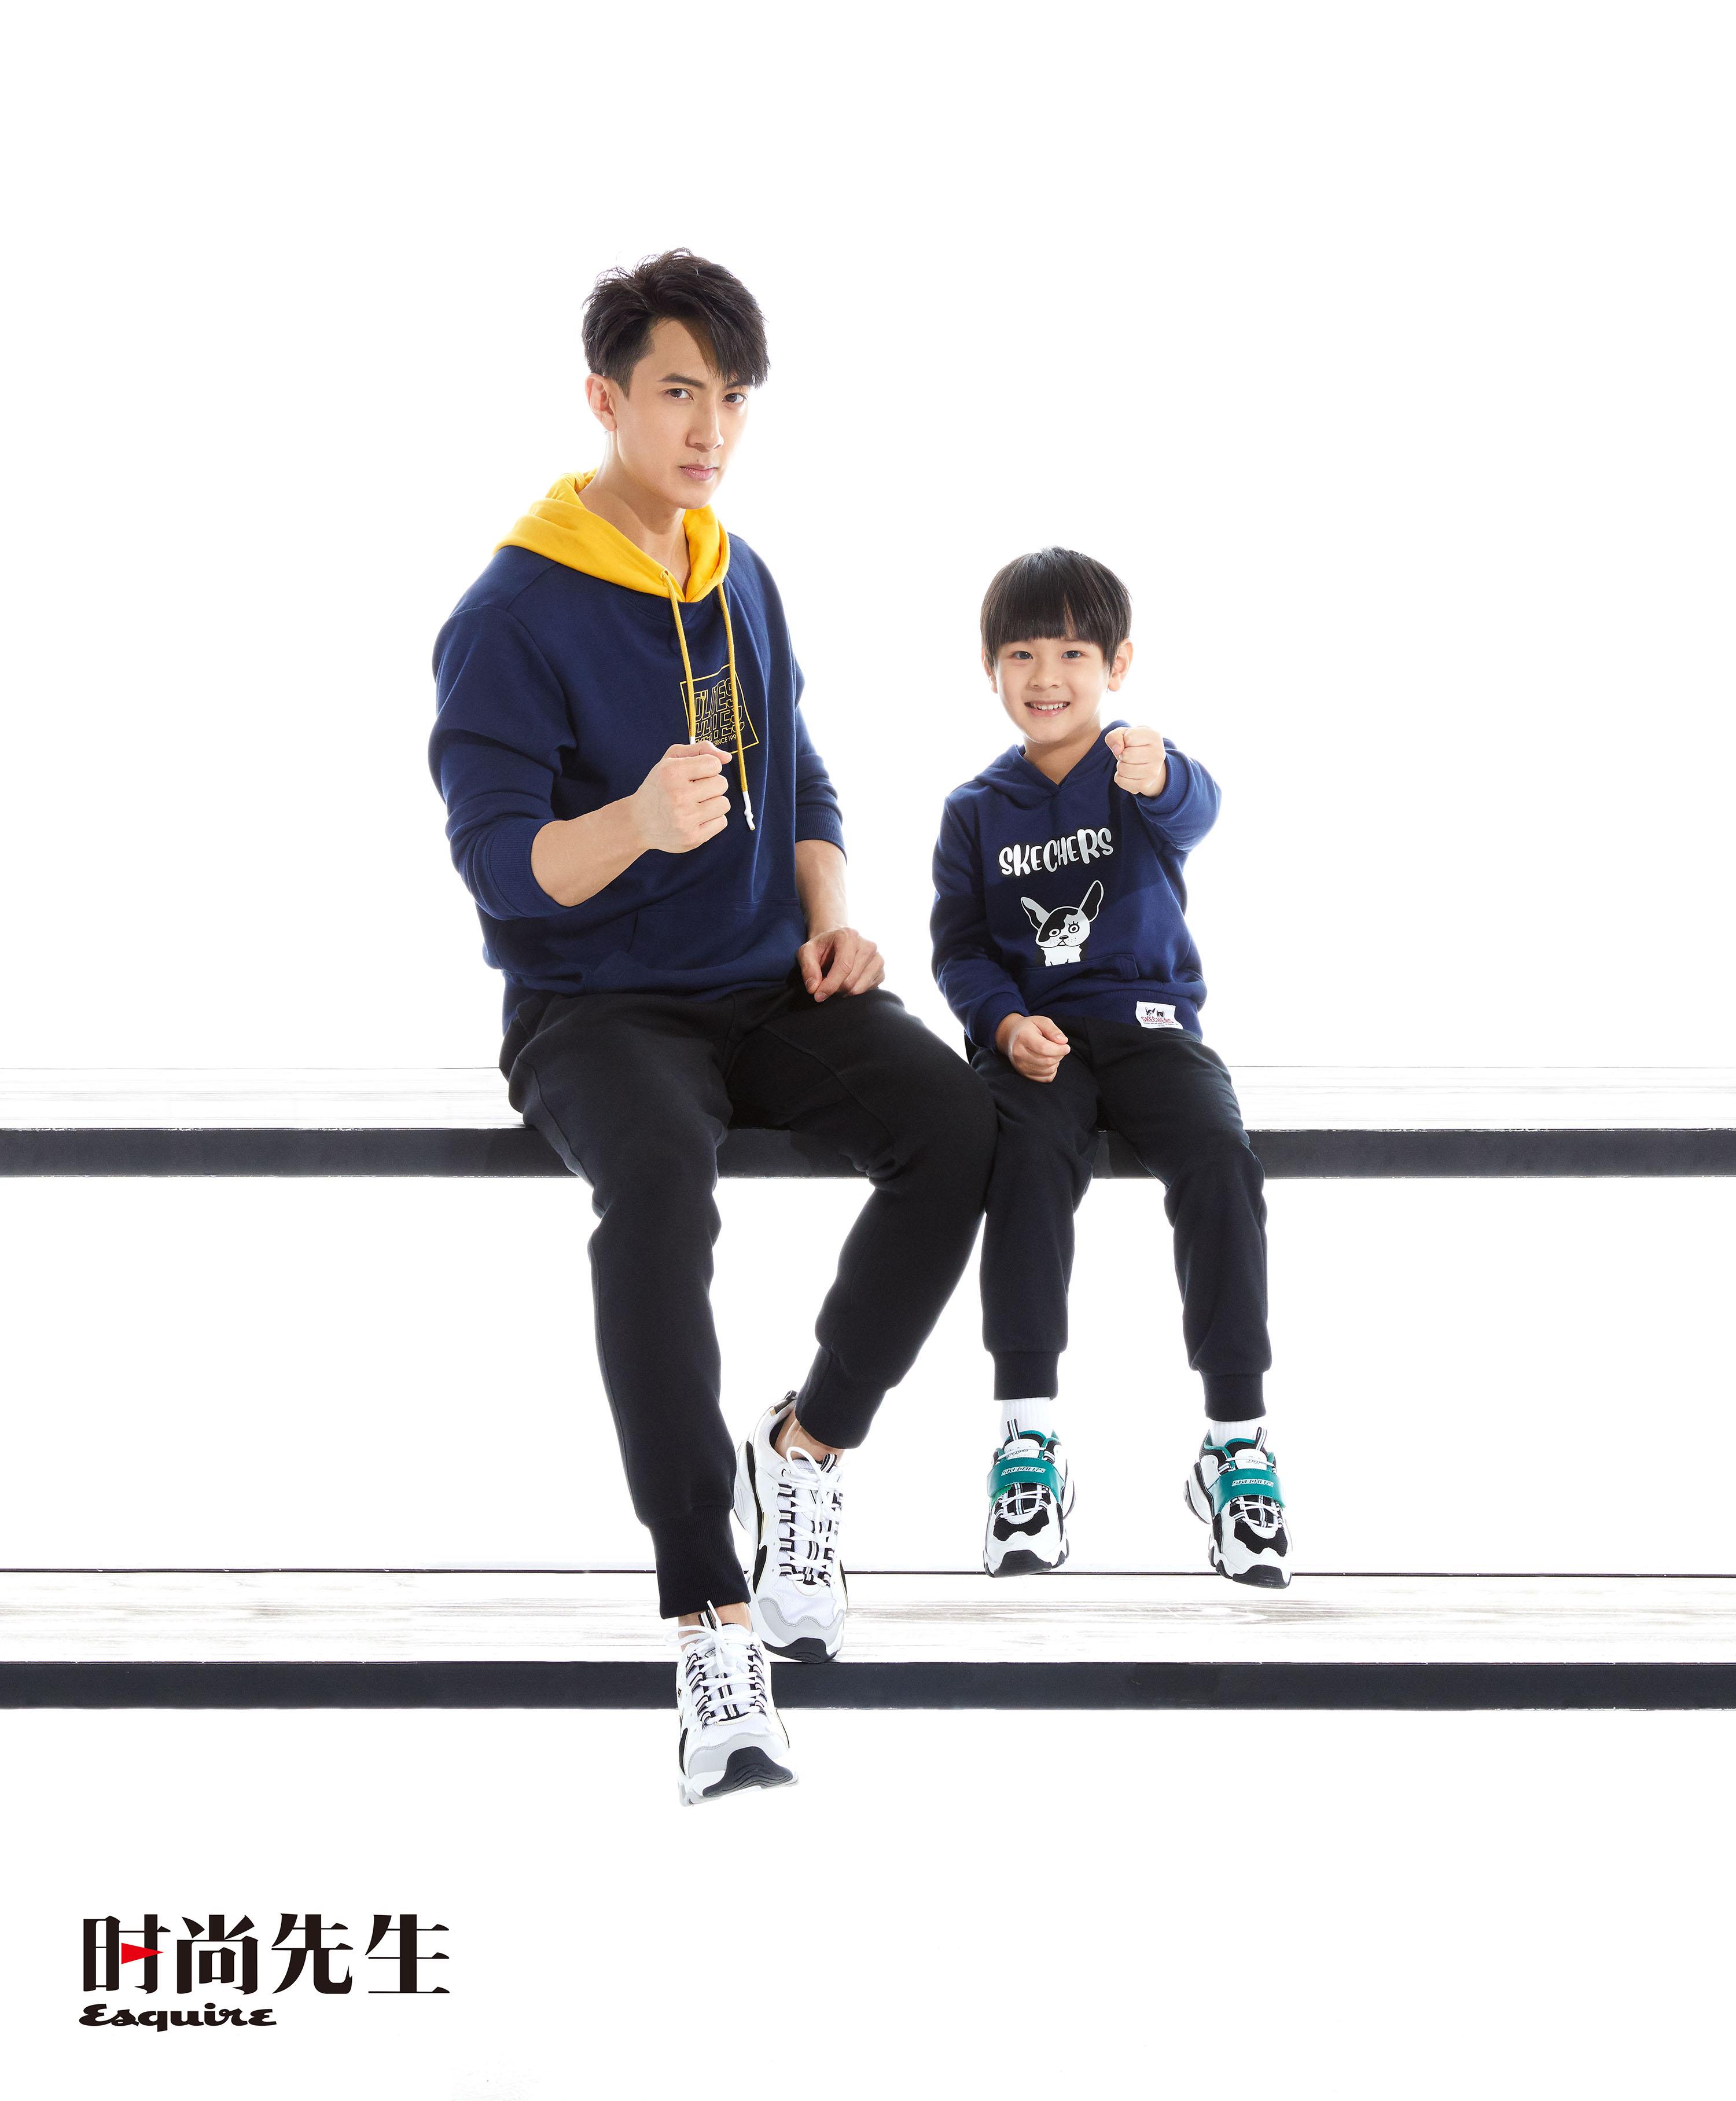 吴尊&Max.jpg